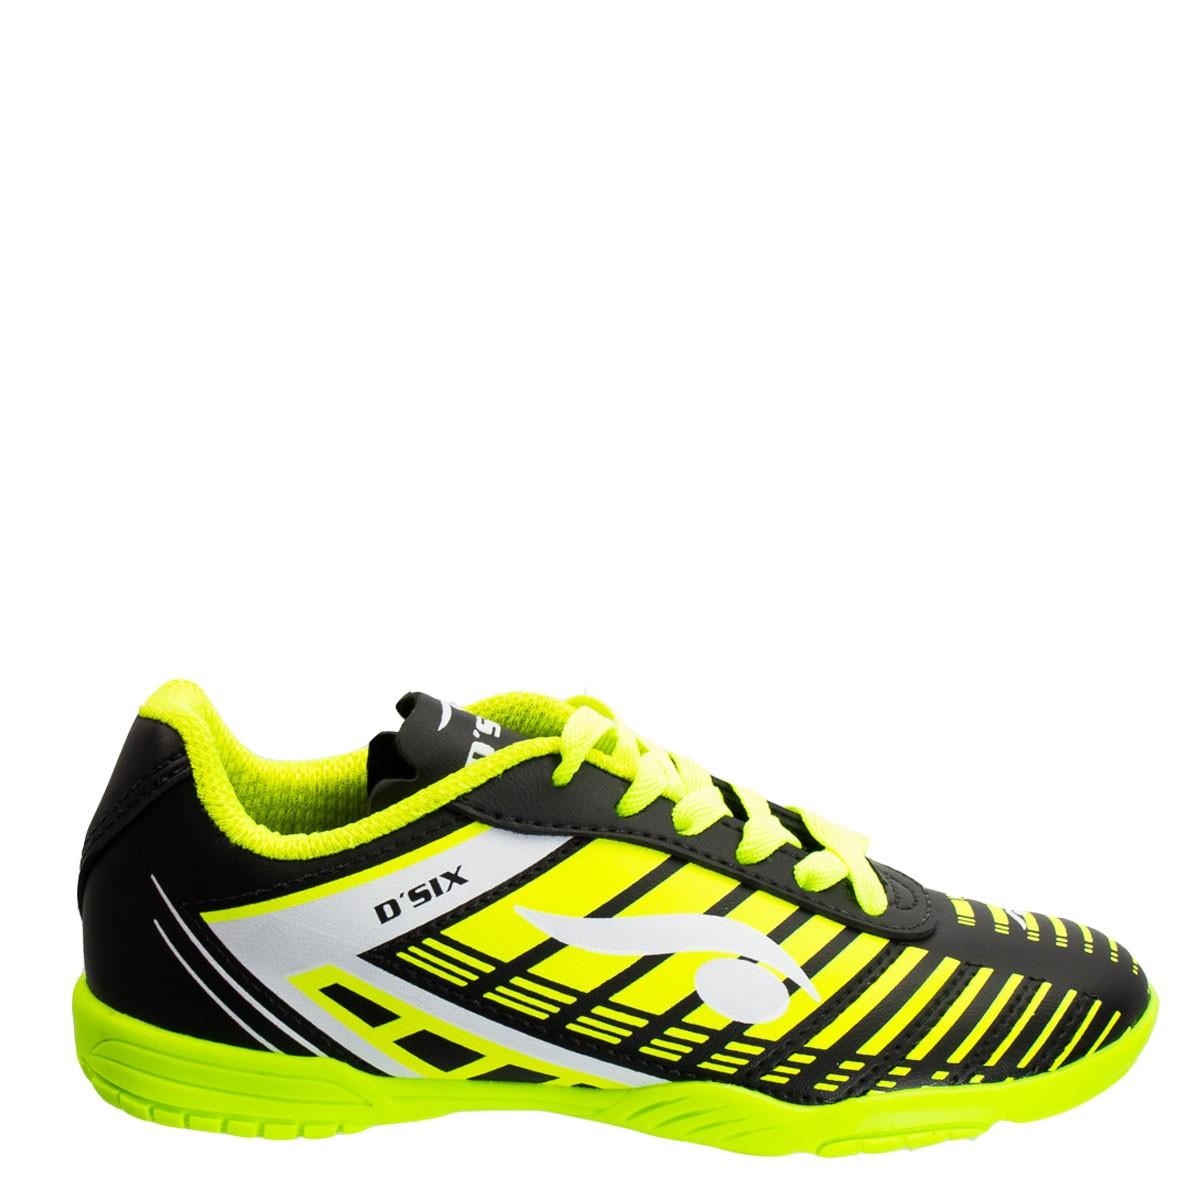 Imagem - Chuteira Futsal Infantil D six Indoor 6202 - 055209 52abd944b35f0